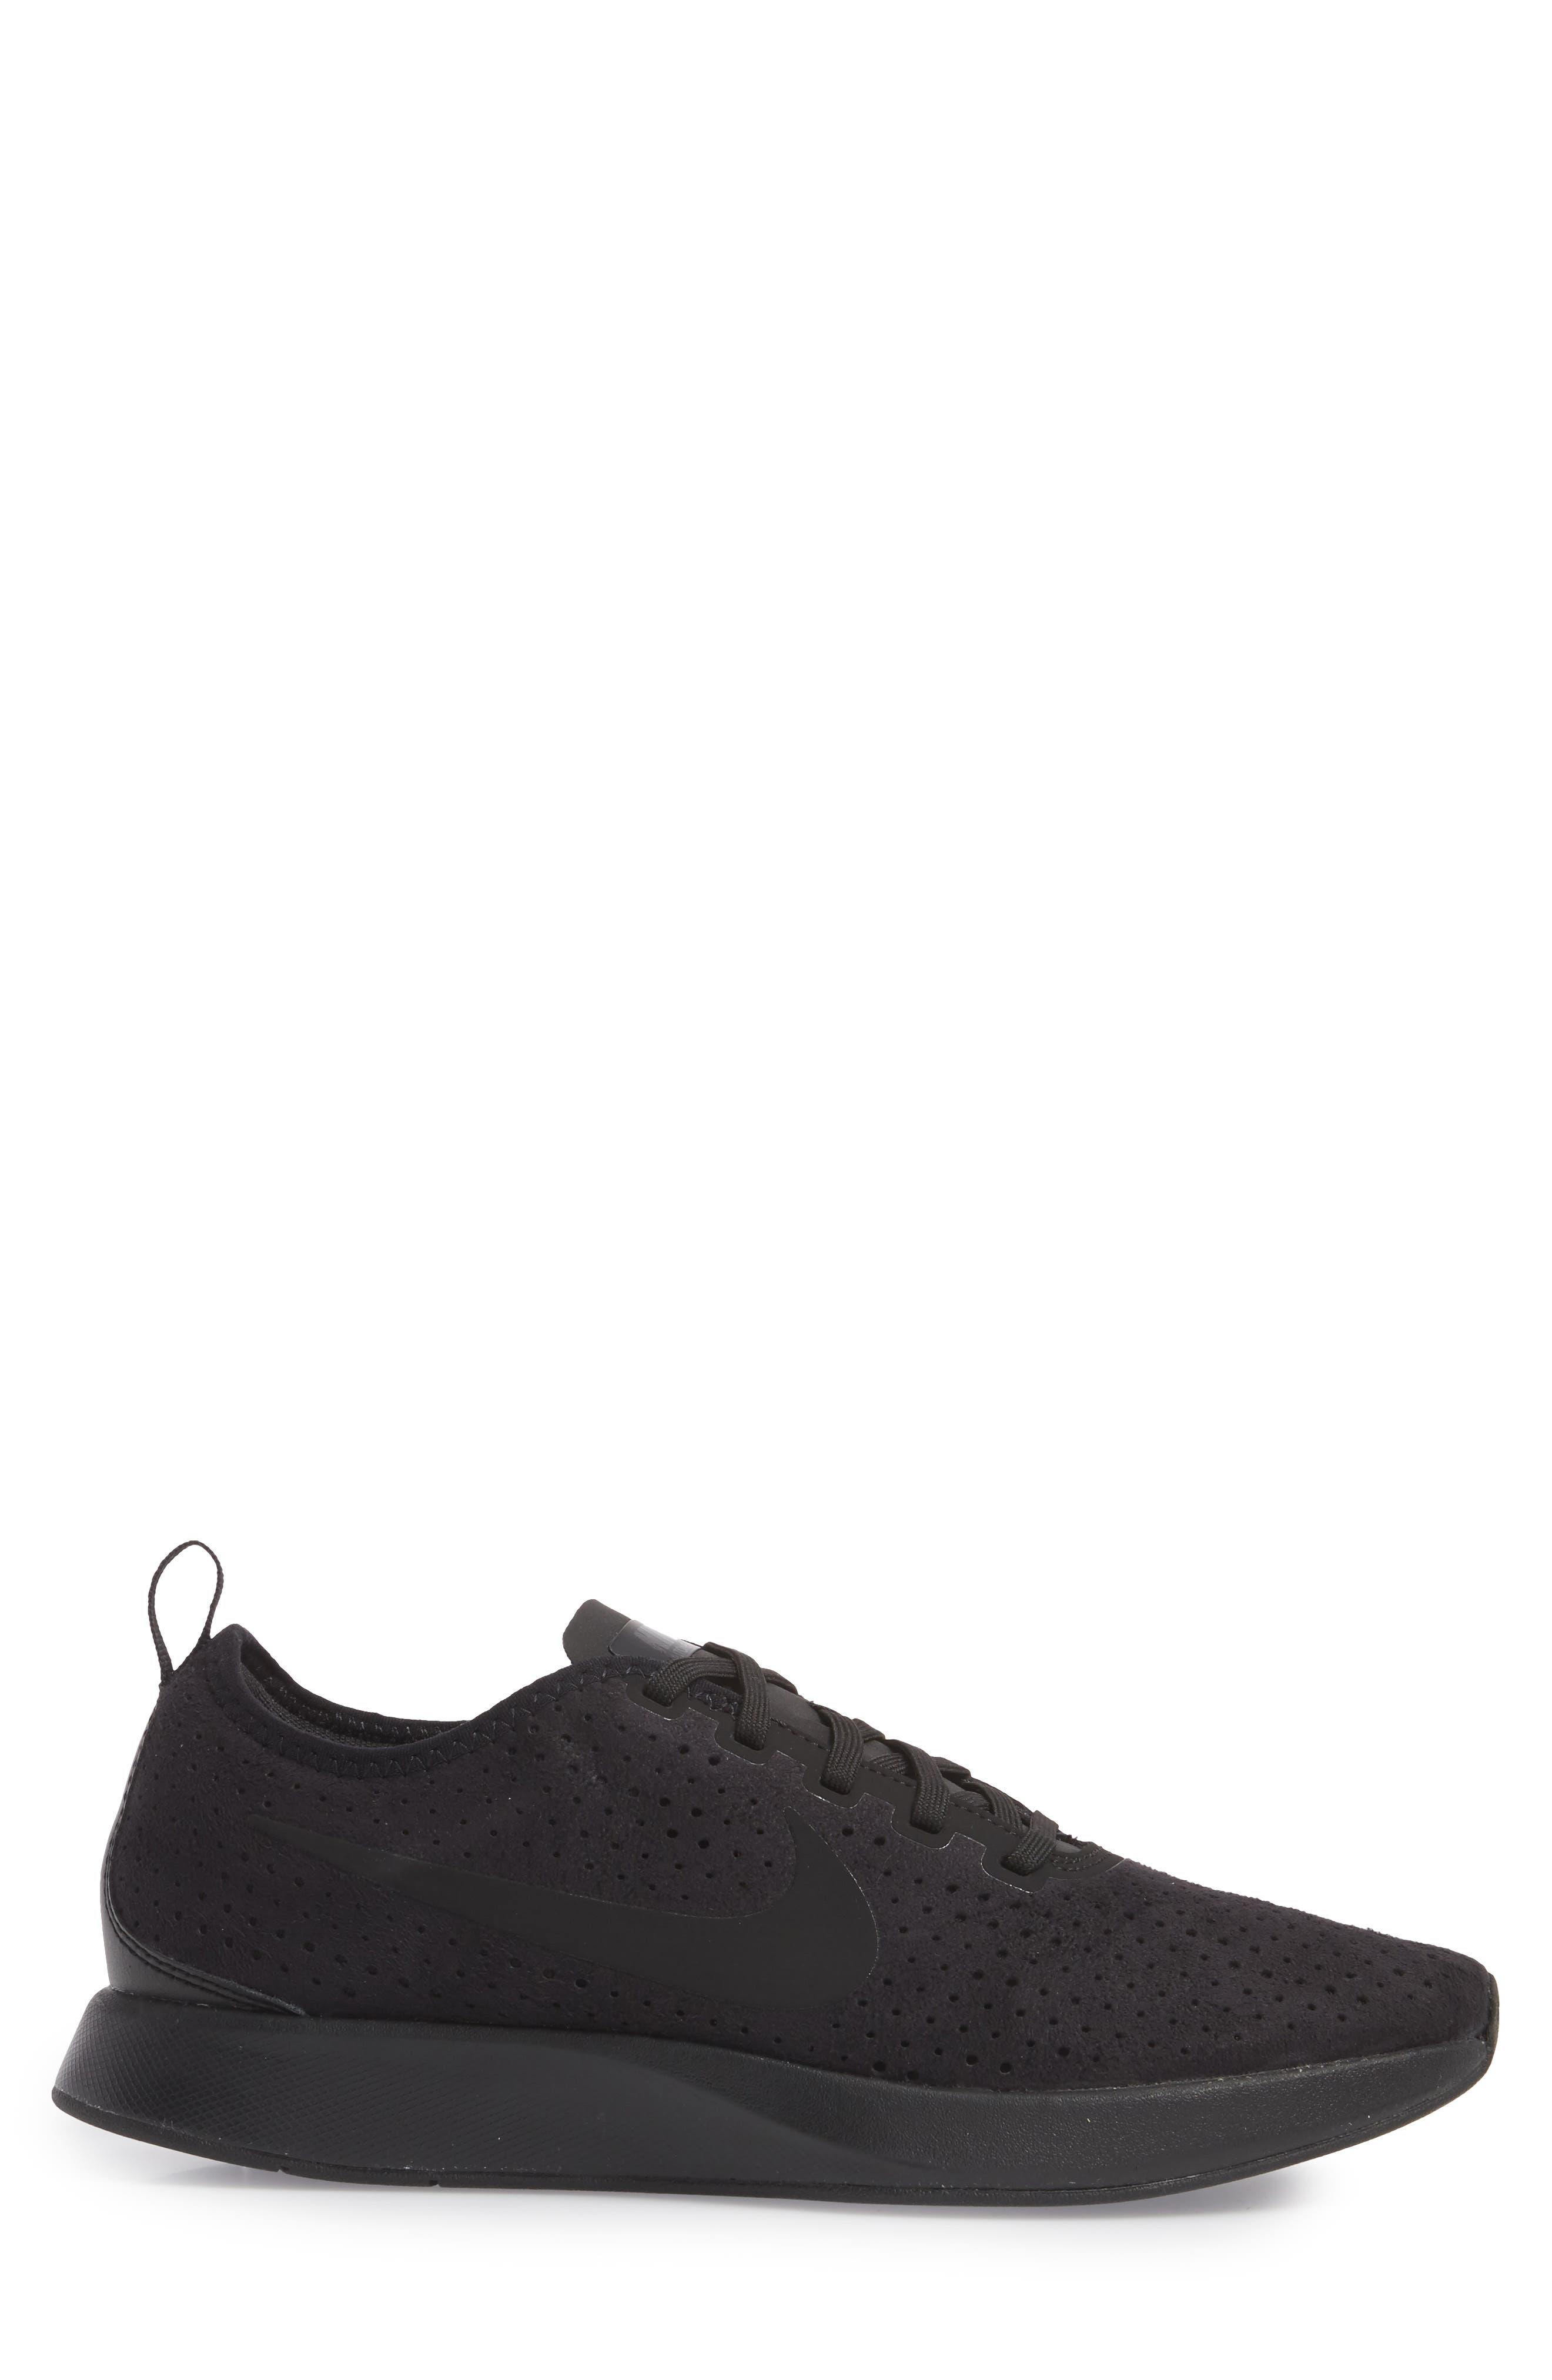 Dualtone Racer Premium Sneaker,                             Alternate thumbnail 3, color,                             004